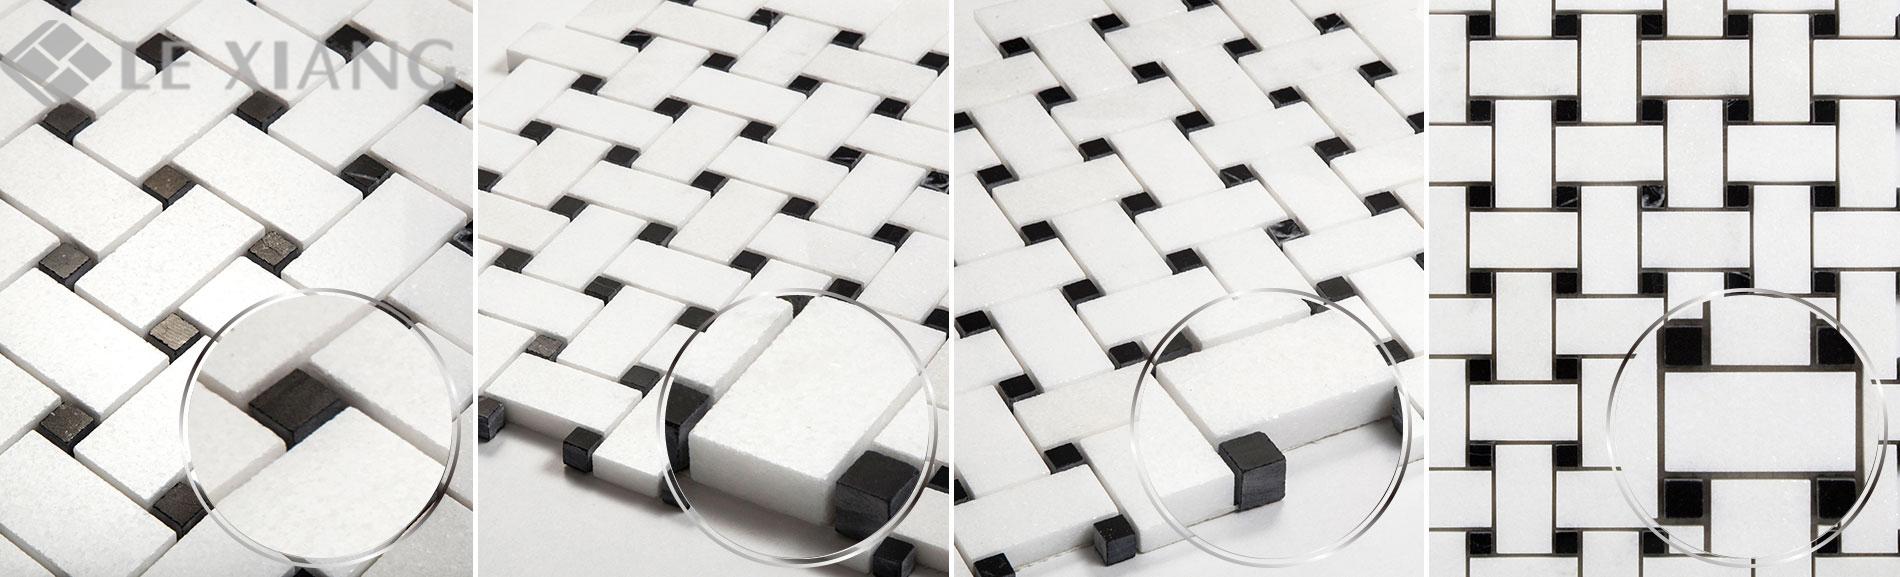 Basketweaveing-White-Thassos-Marble-Mosaic-For-Bothroom-Floors-5